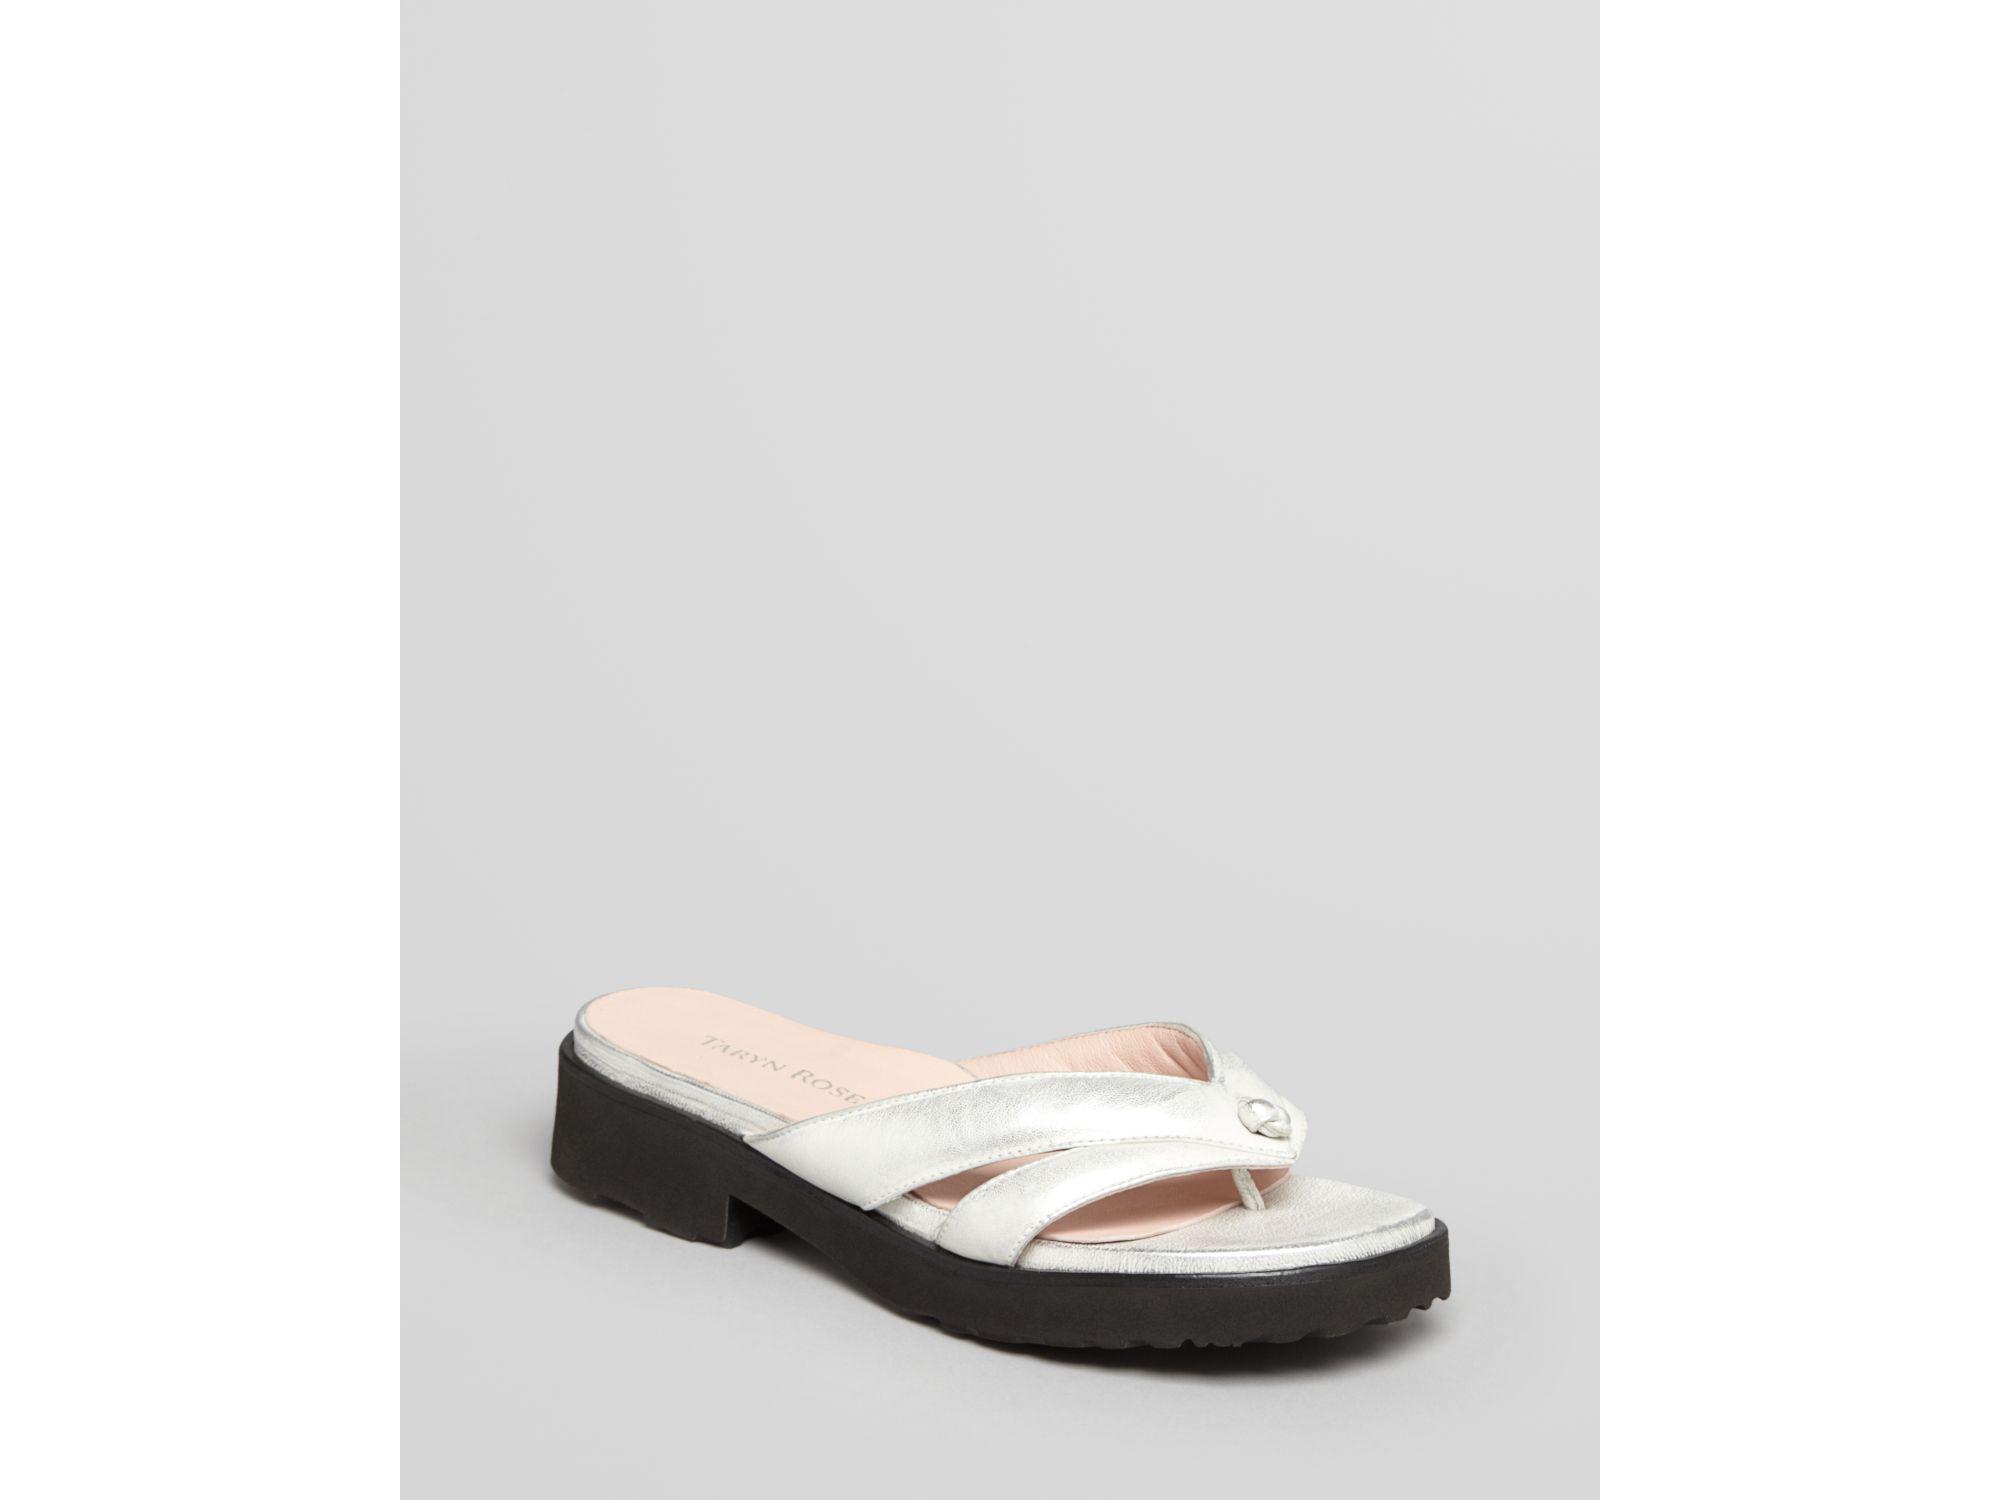 6ad55f7c05bb Lyst - Taryn Rose Platform Thong Sandals Tacy in Metallic